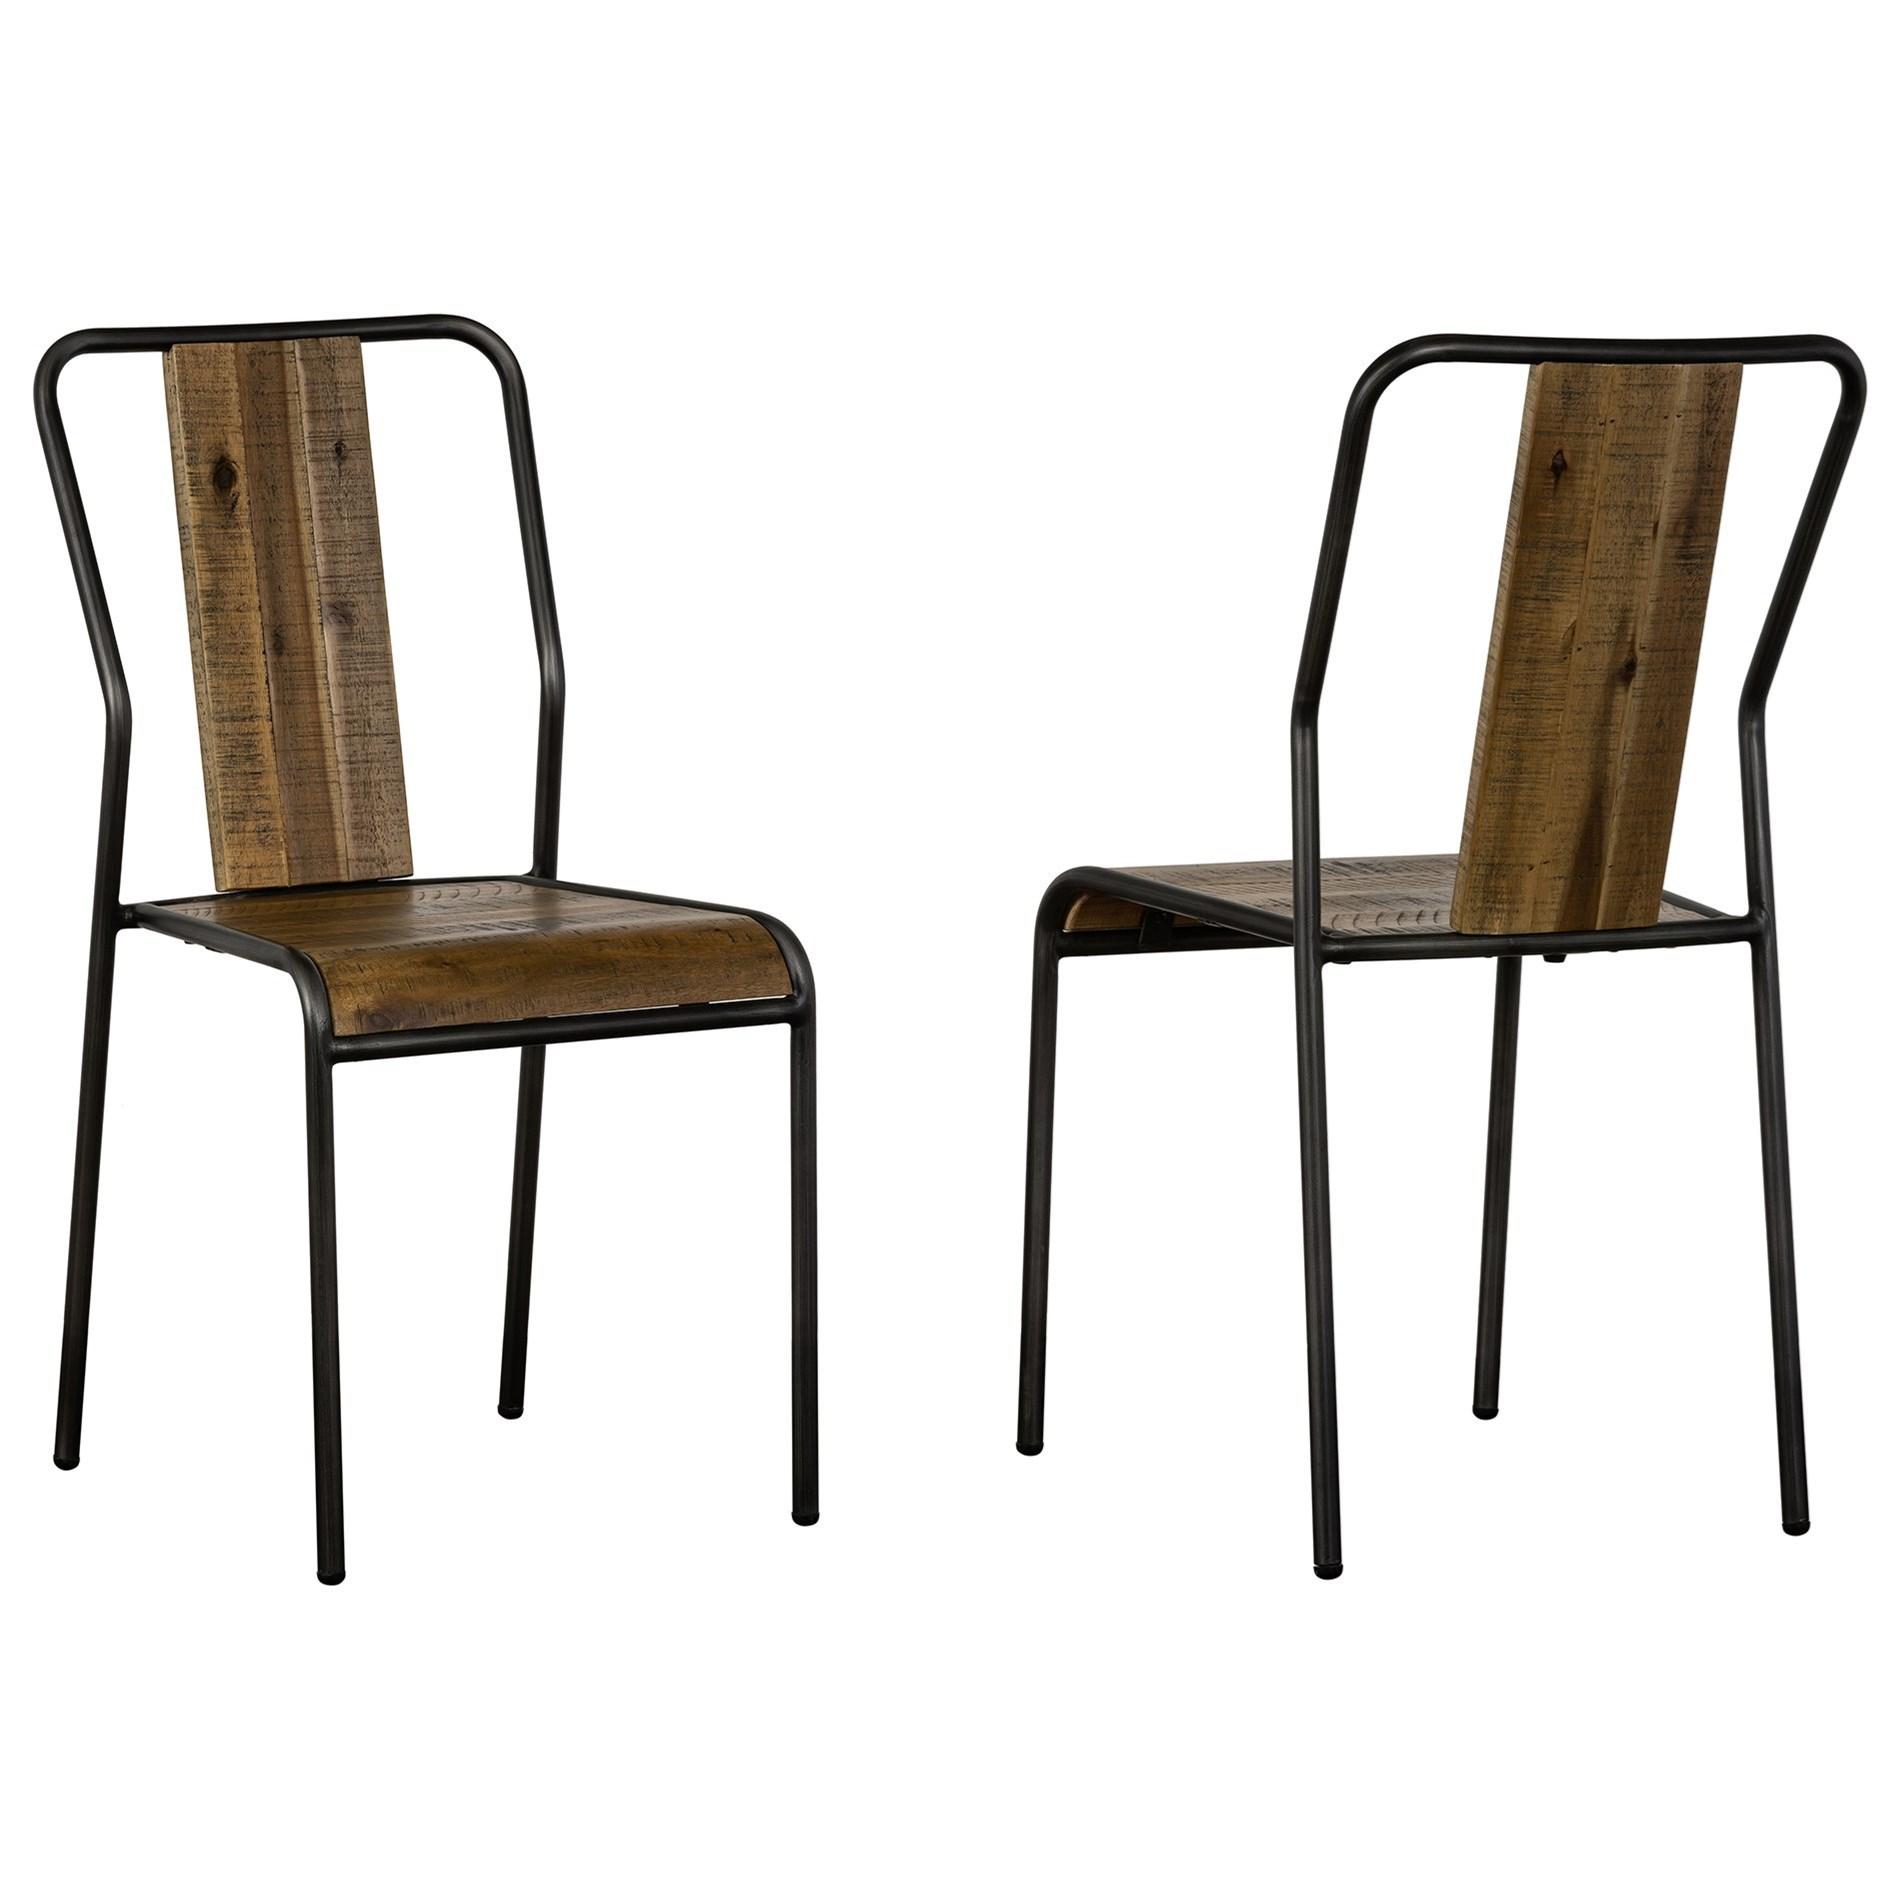 Cusco  Acacia Rustic Dining Chair - Set of 2 at Sadler's Home Furnishings